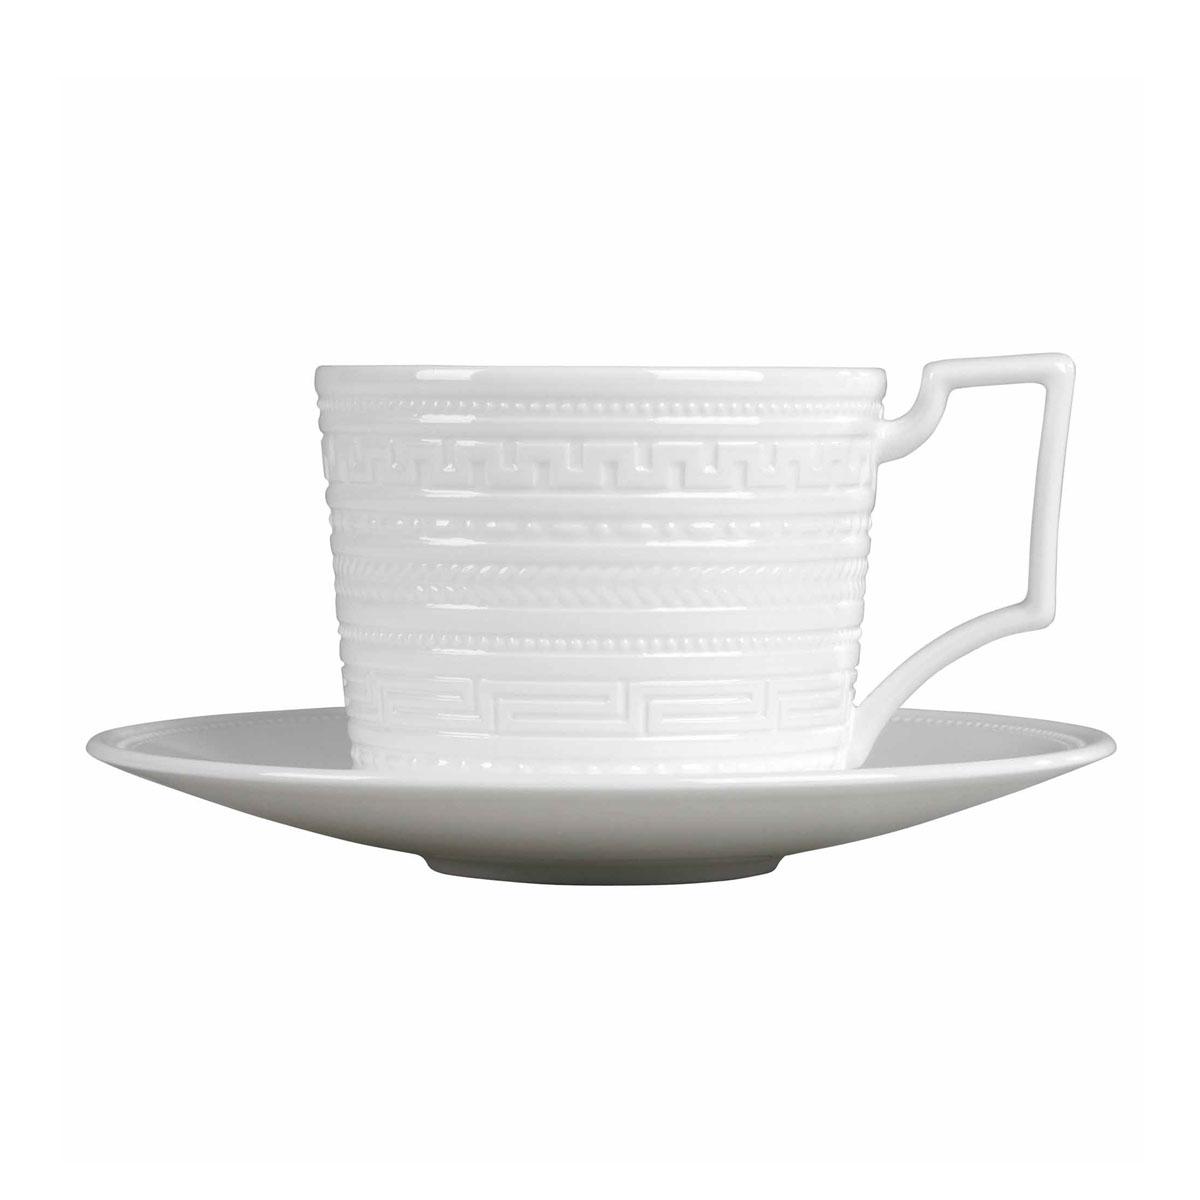 Wedgwood Intaglio Teacup and Saucer